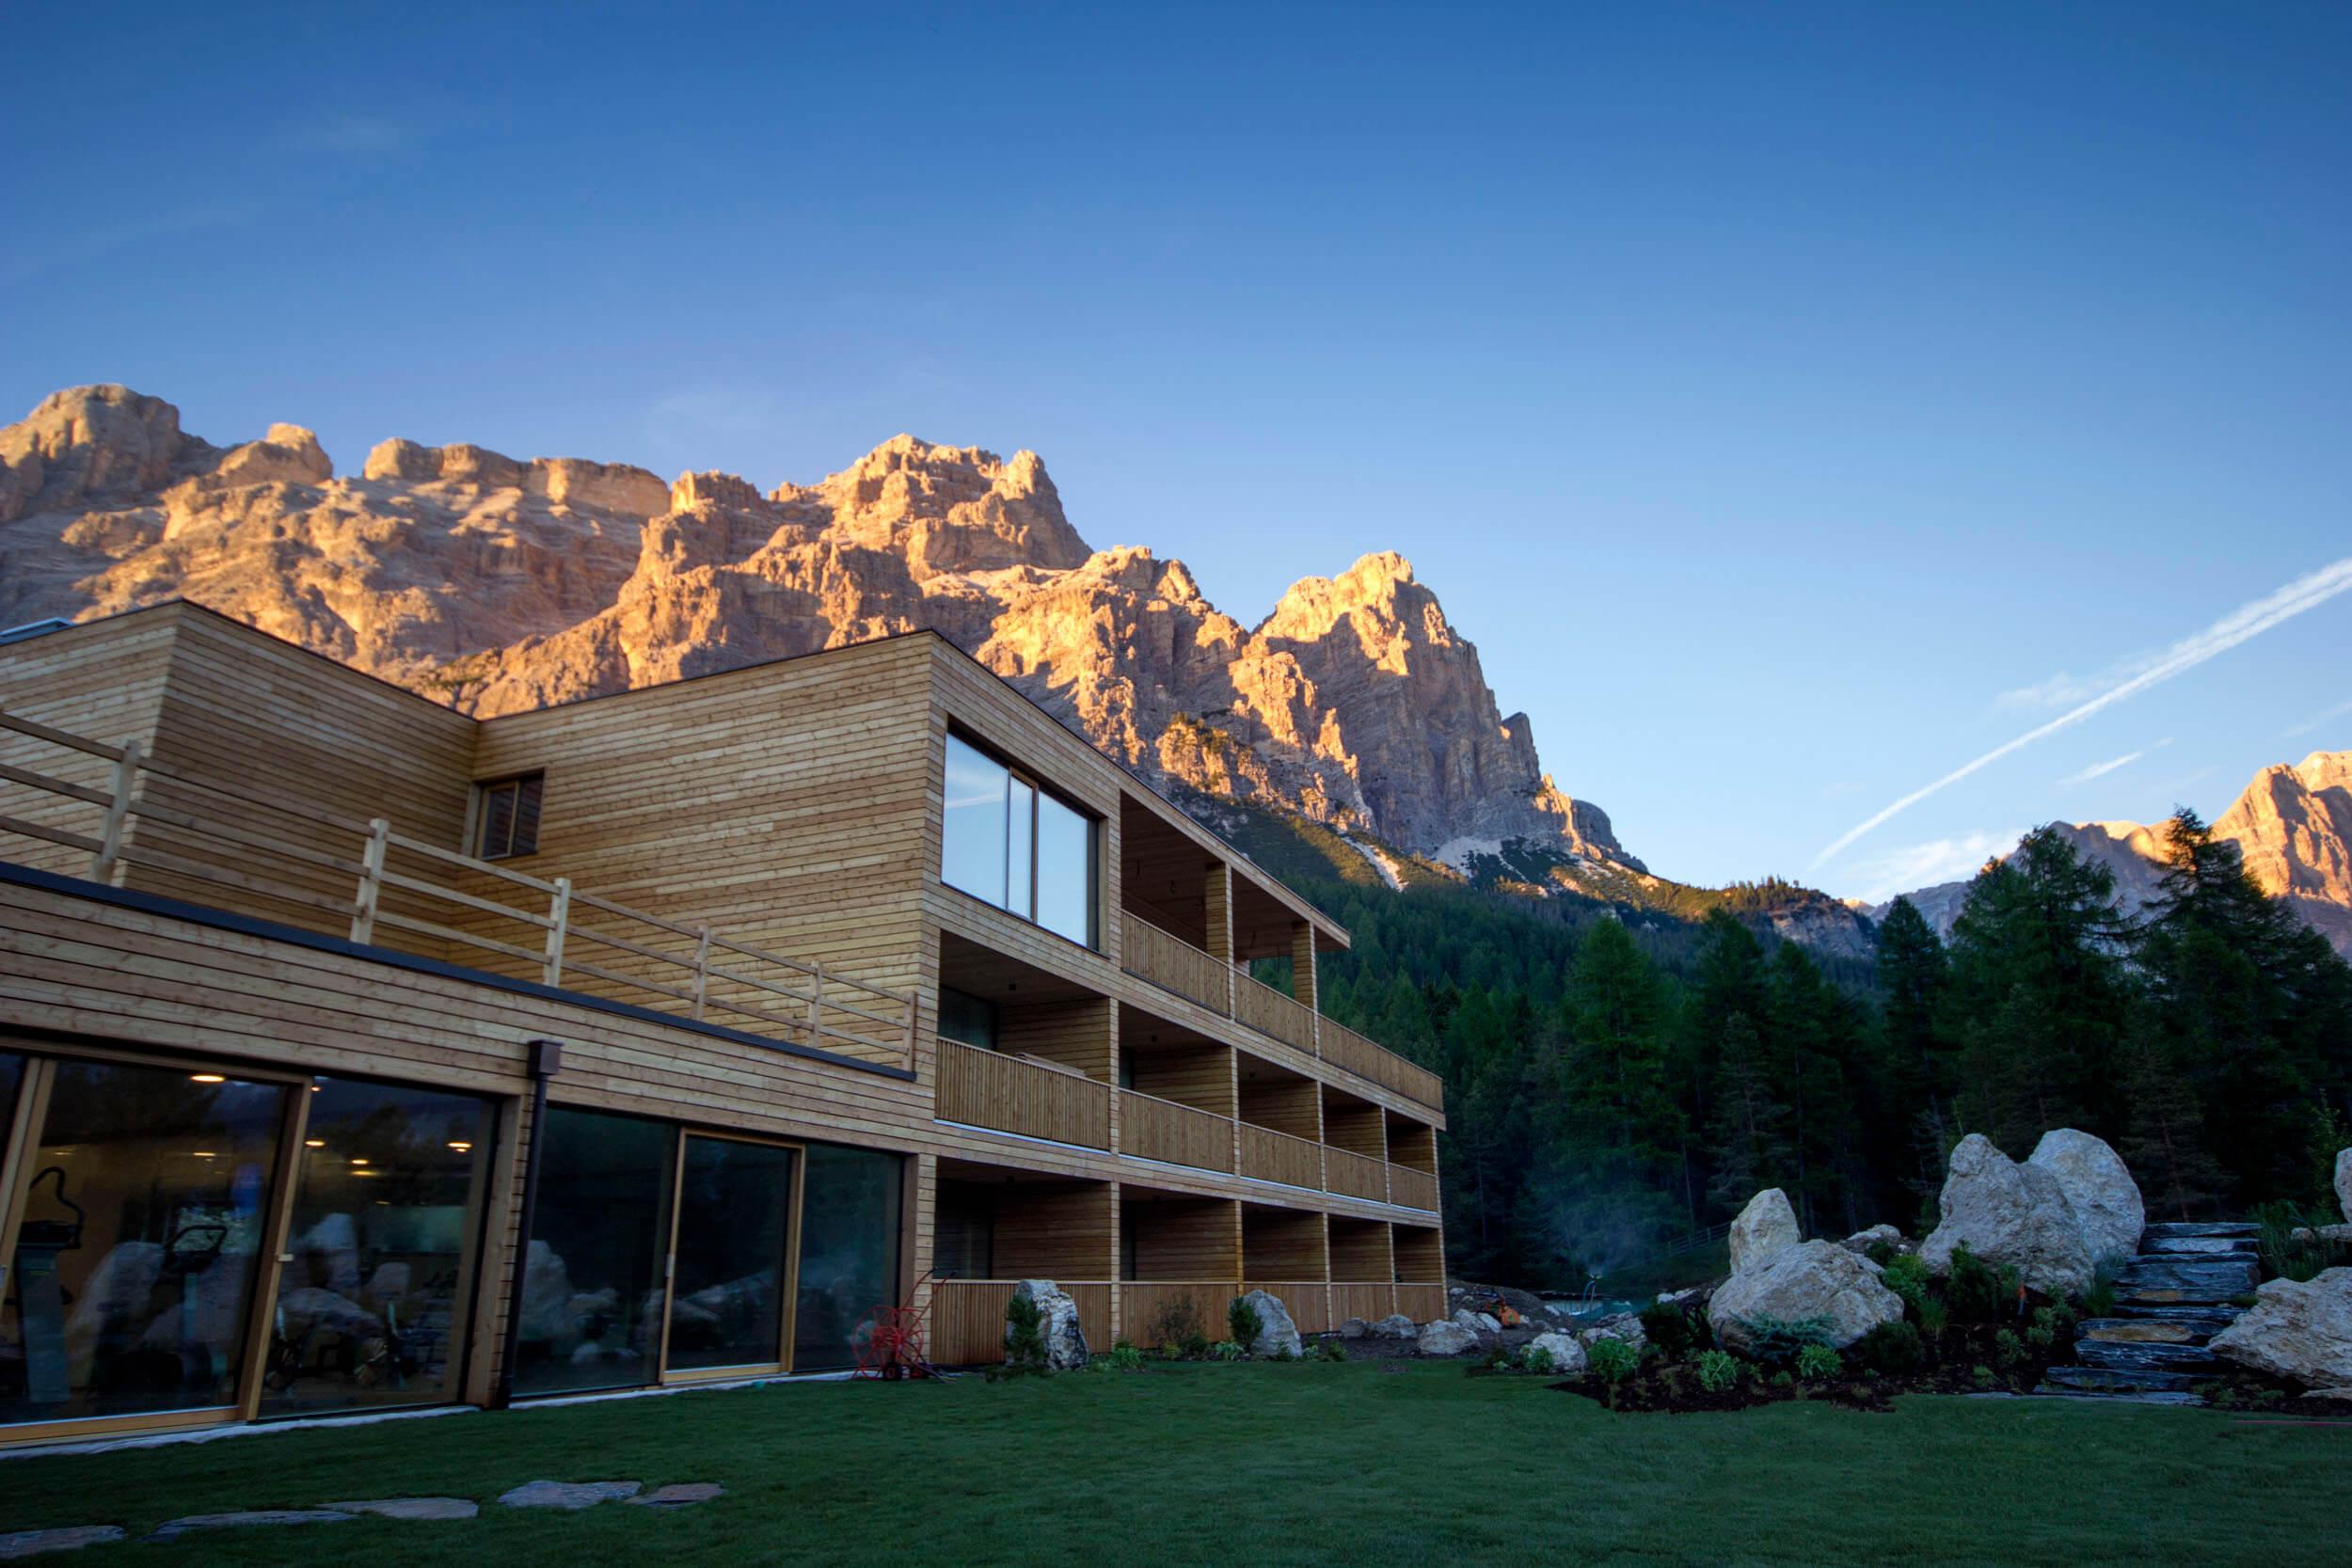 Hotel Gran Paradiso in St. Kassian